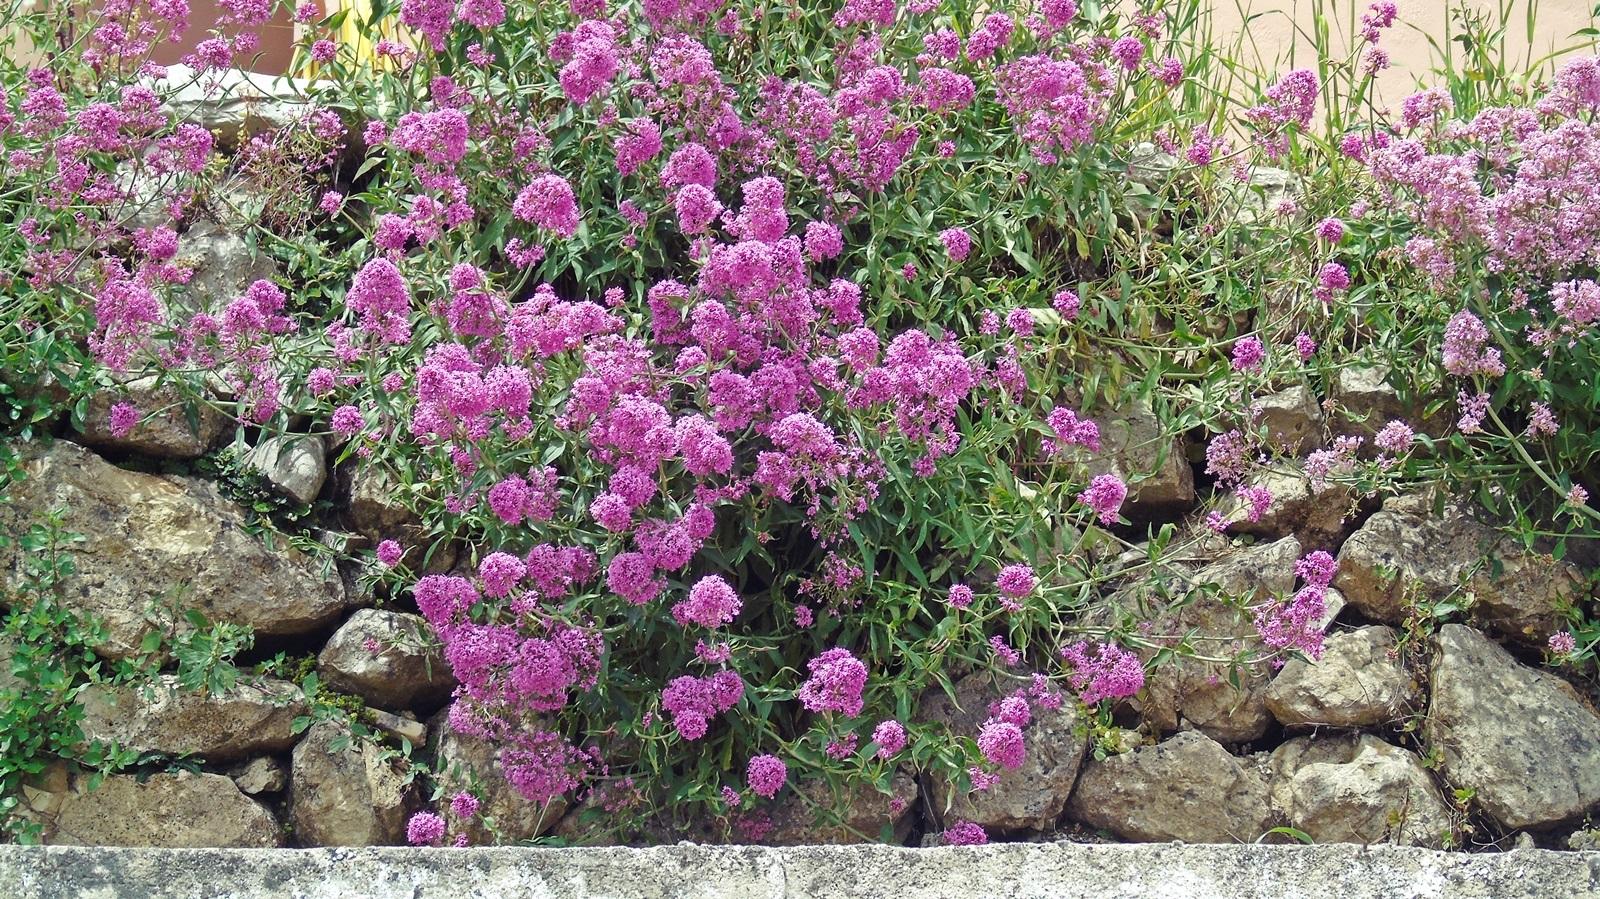 1_Centranthus ruber